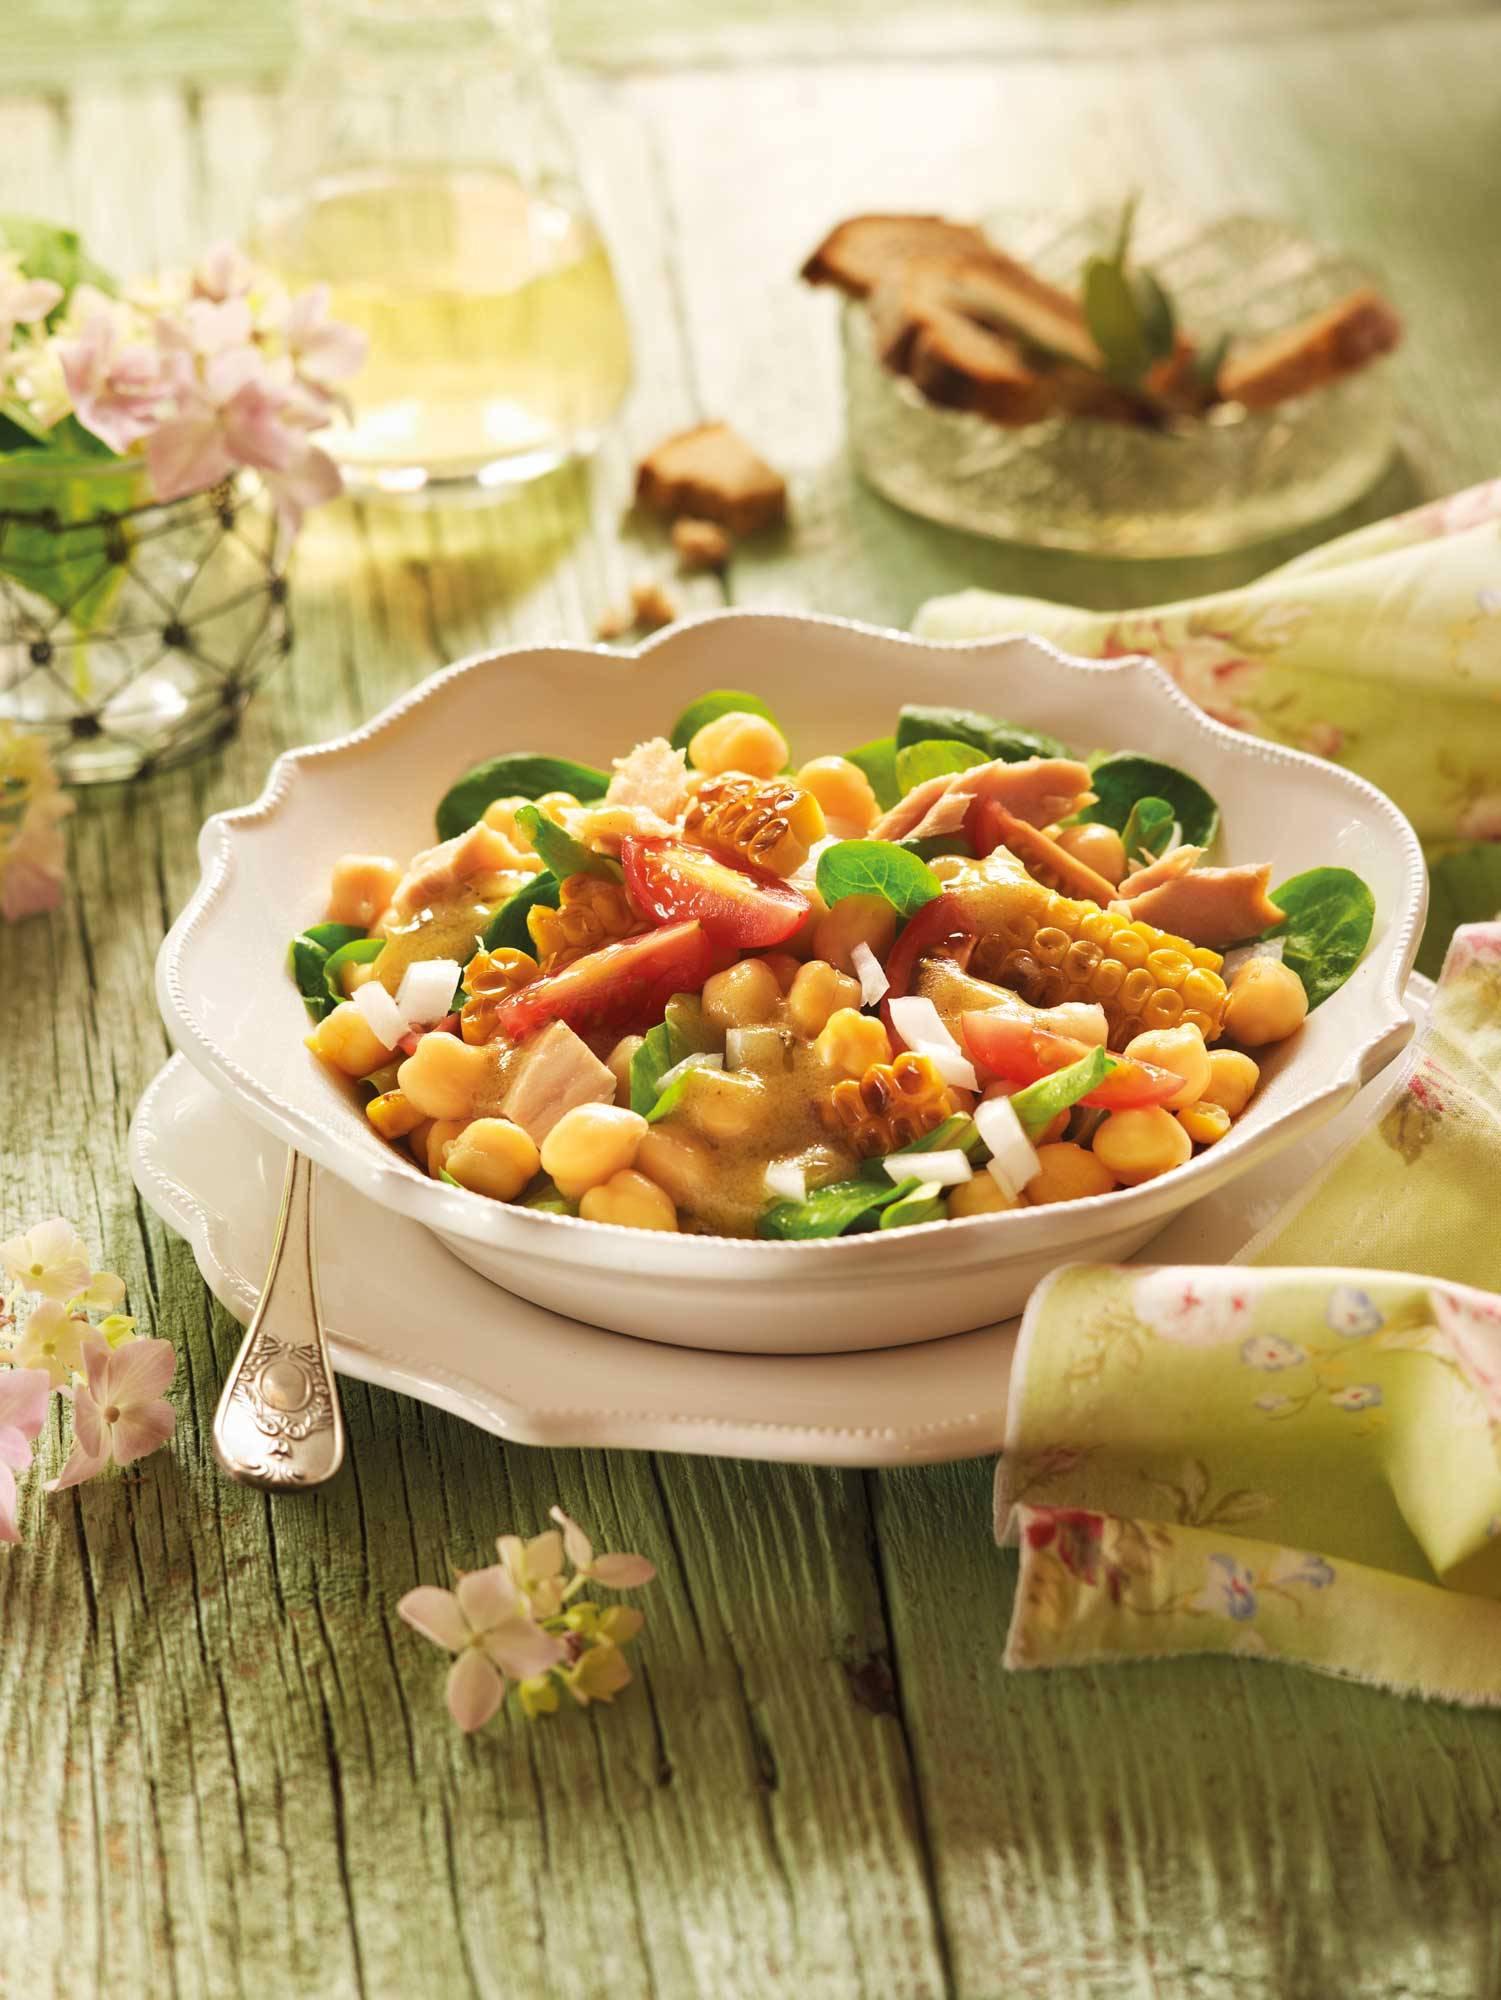 recipes-improve-health-chickpeas-tuna 00388404